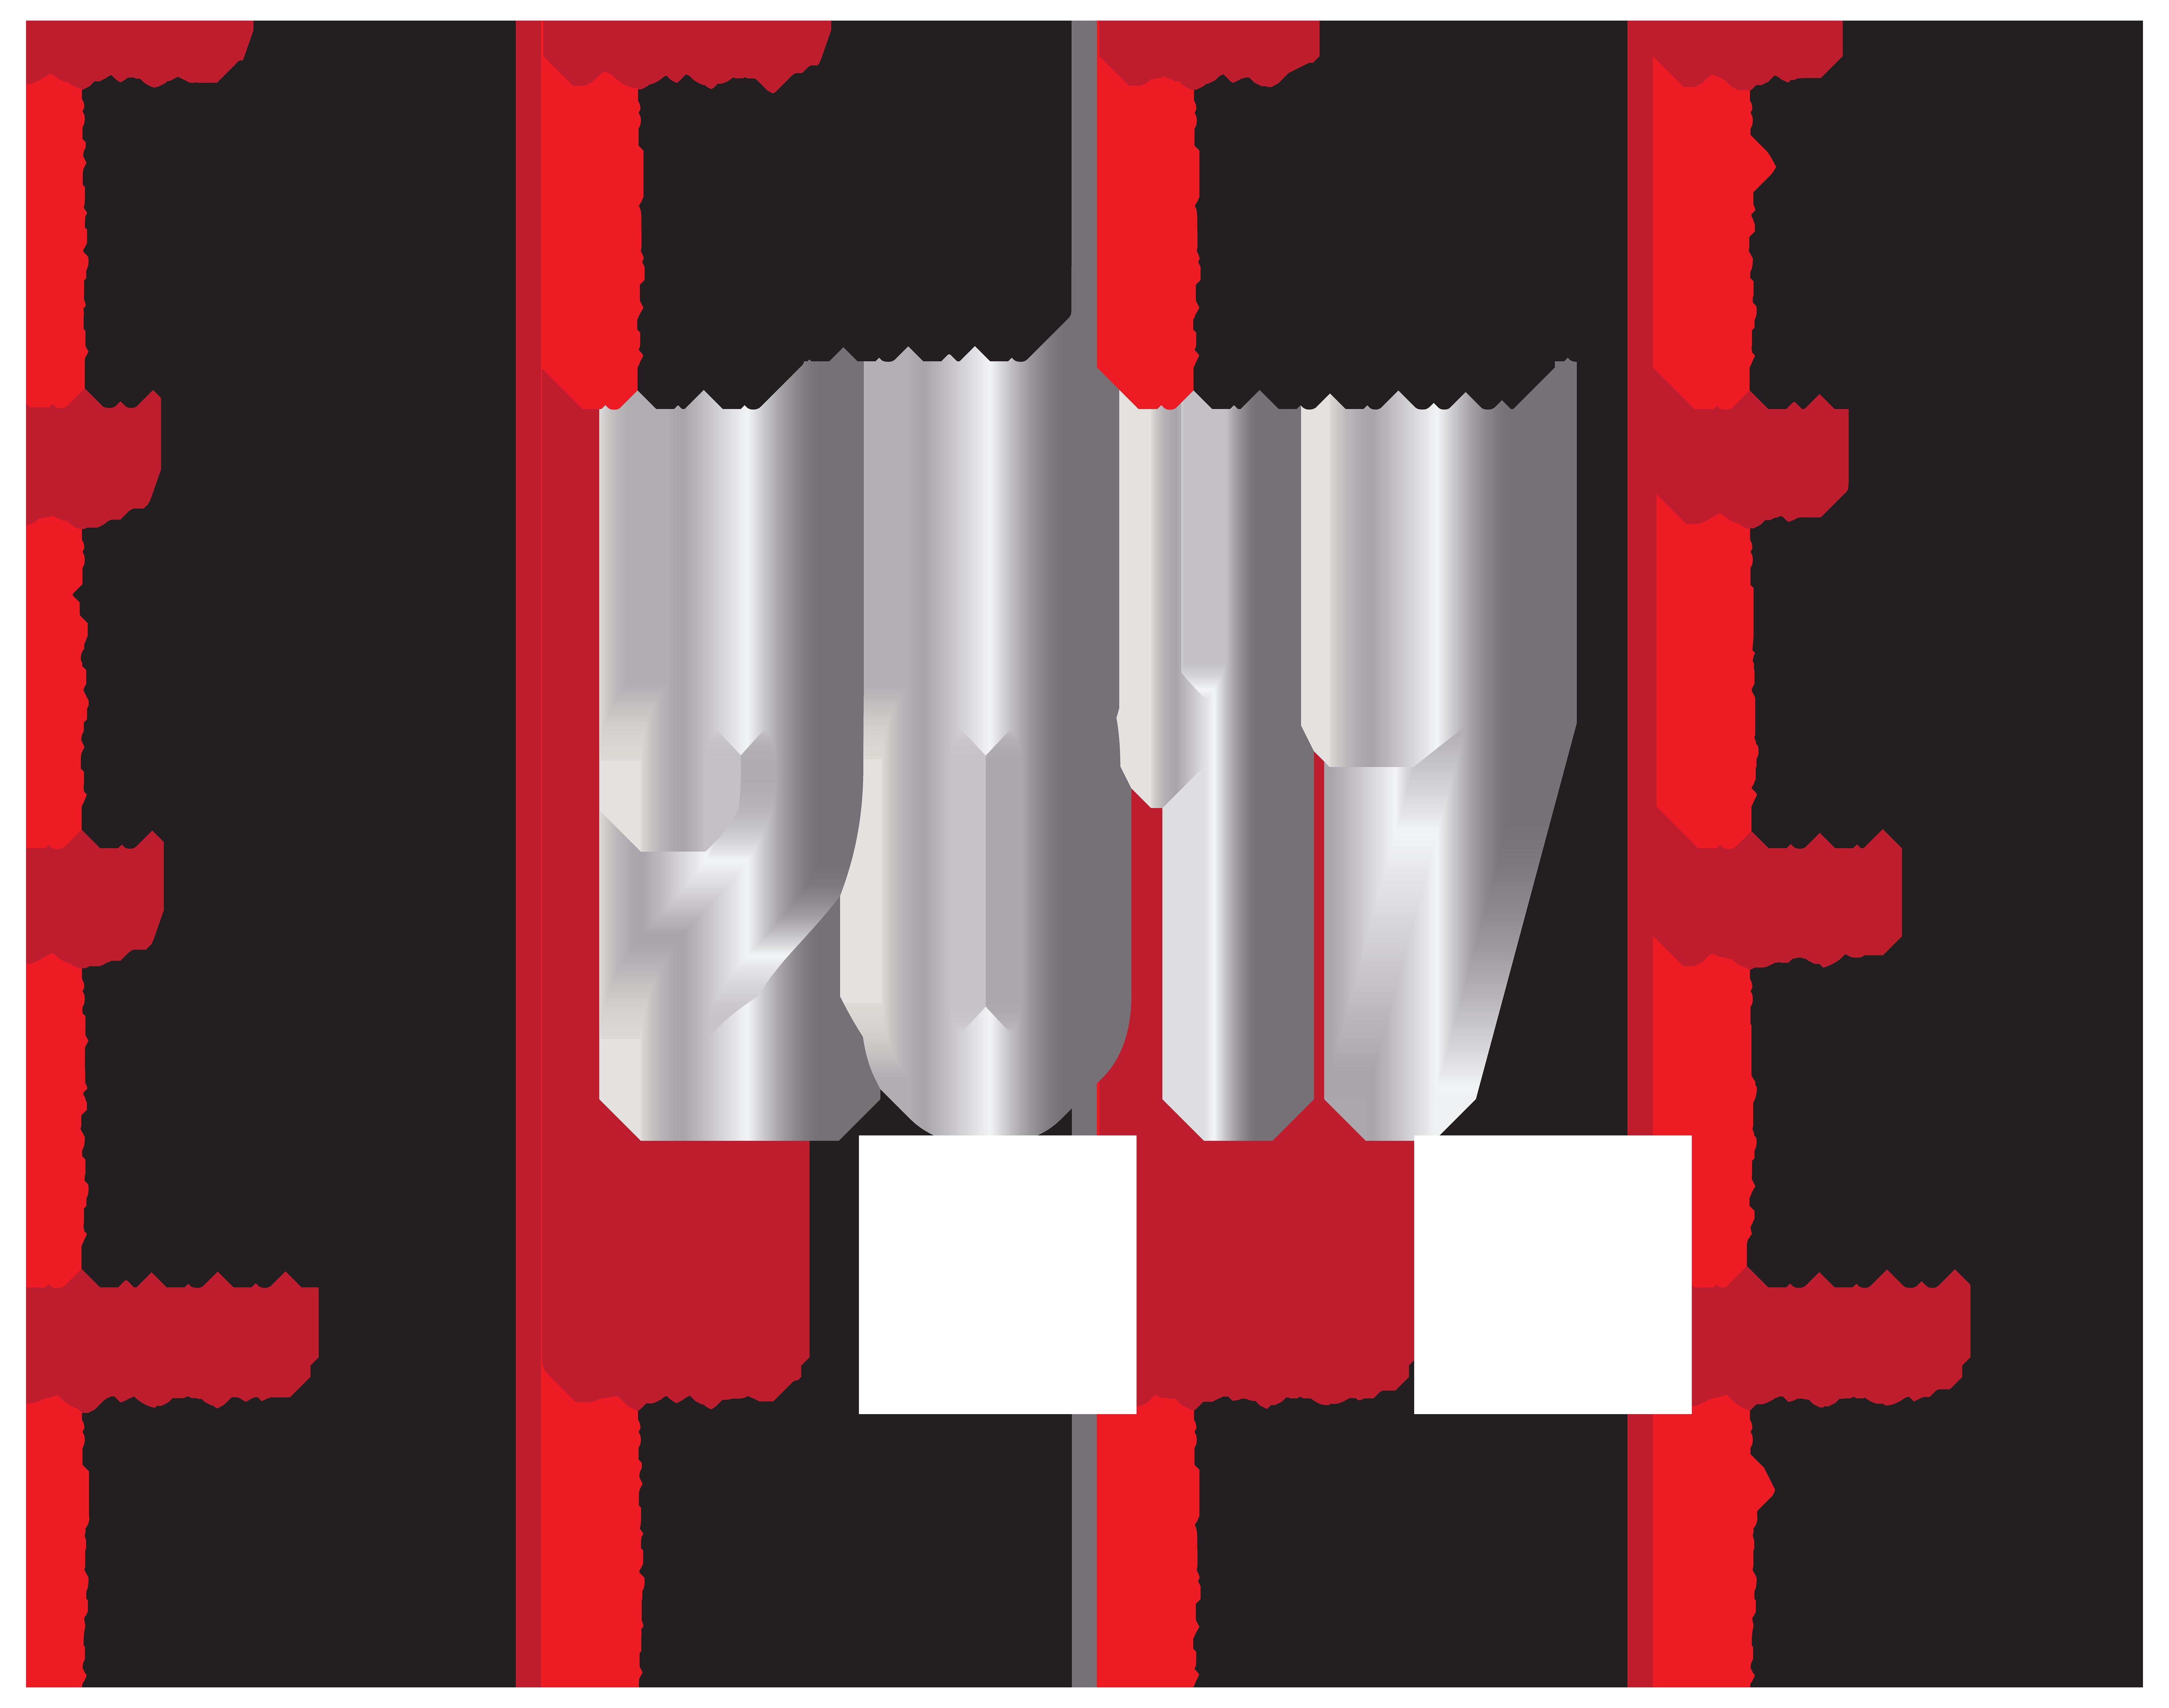 2017 Transparent Calendar PNG Clip Art Image.